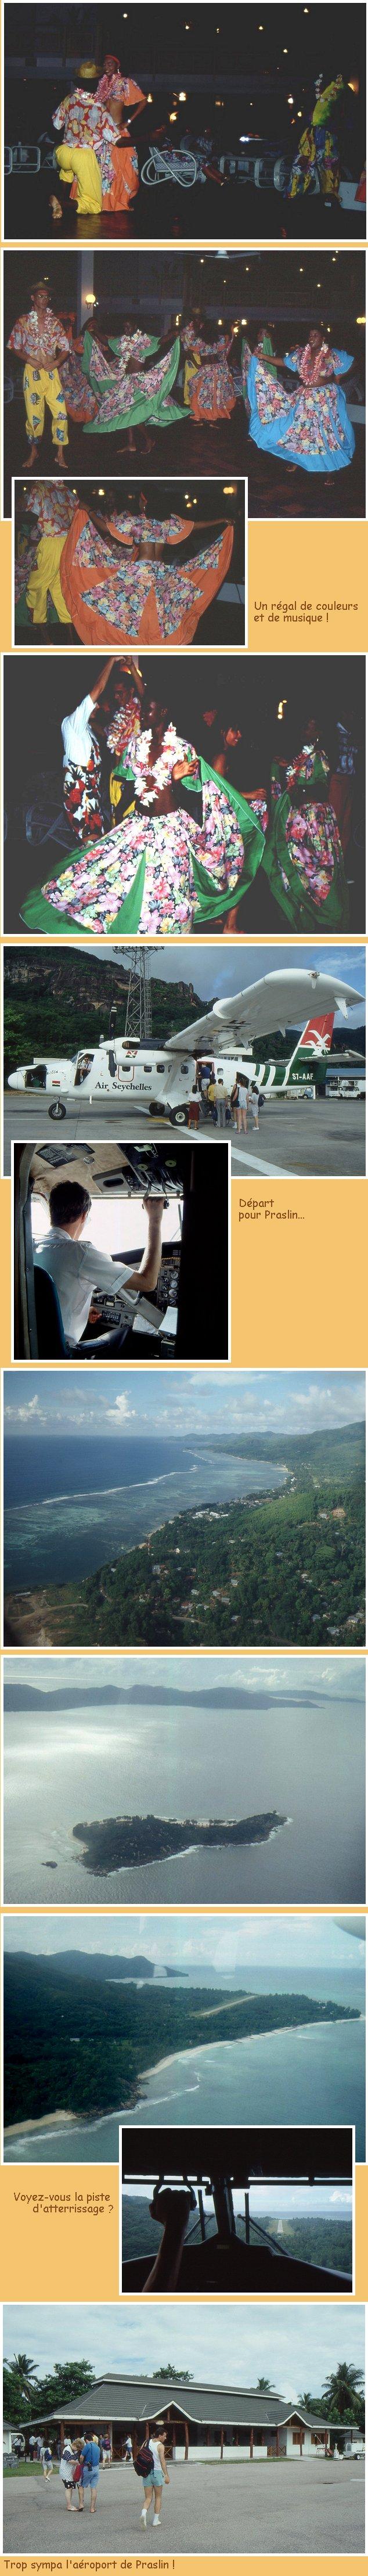 Les Seychelles - 5